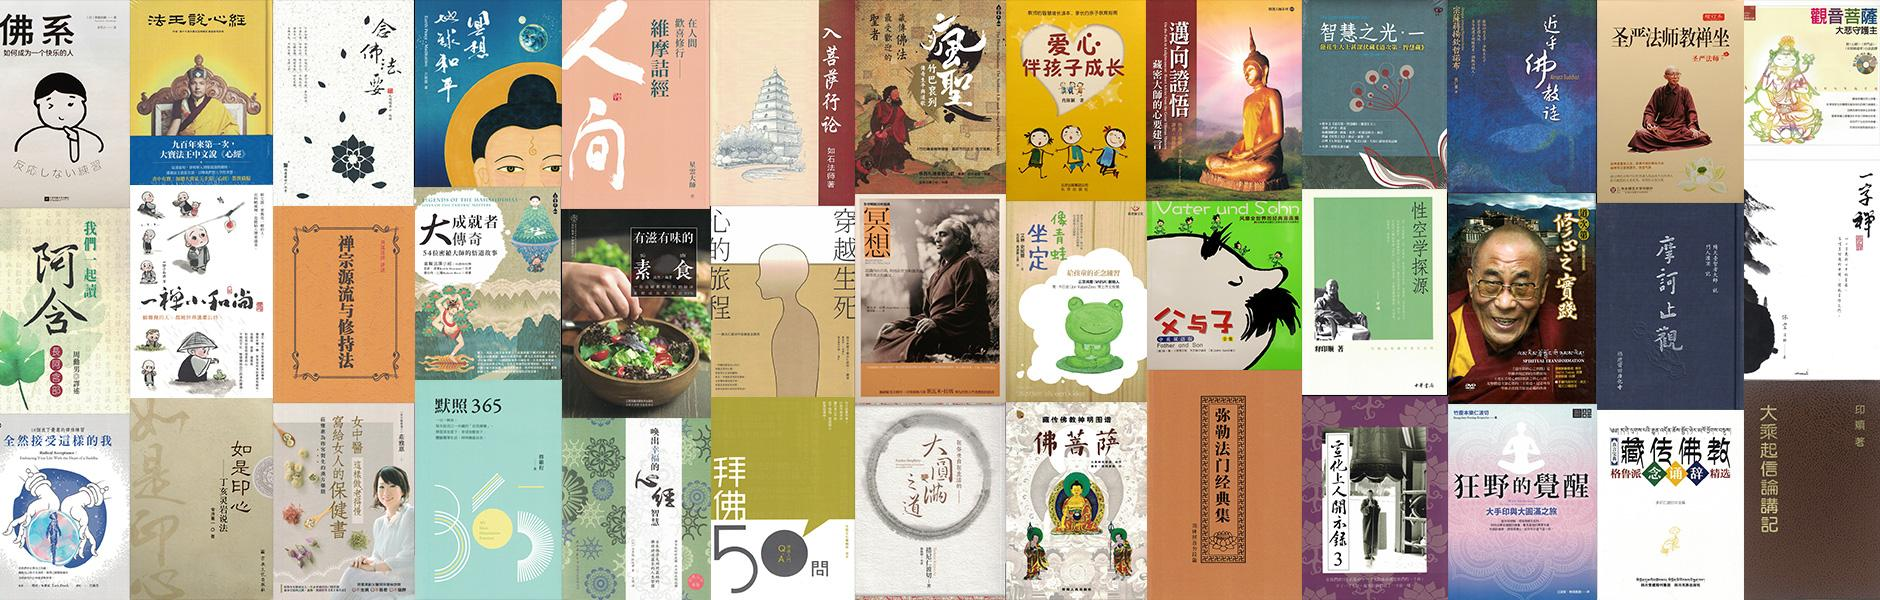 Chinese books  华文书籍